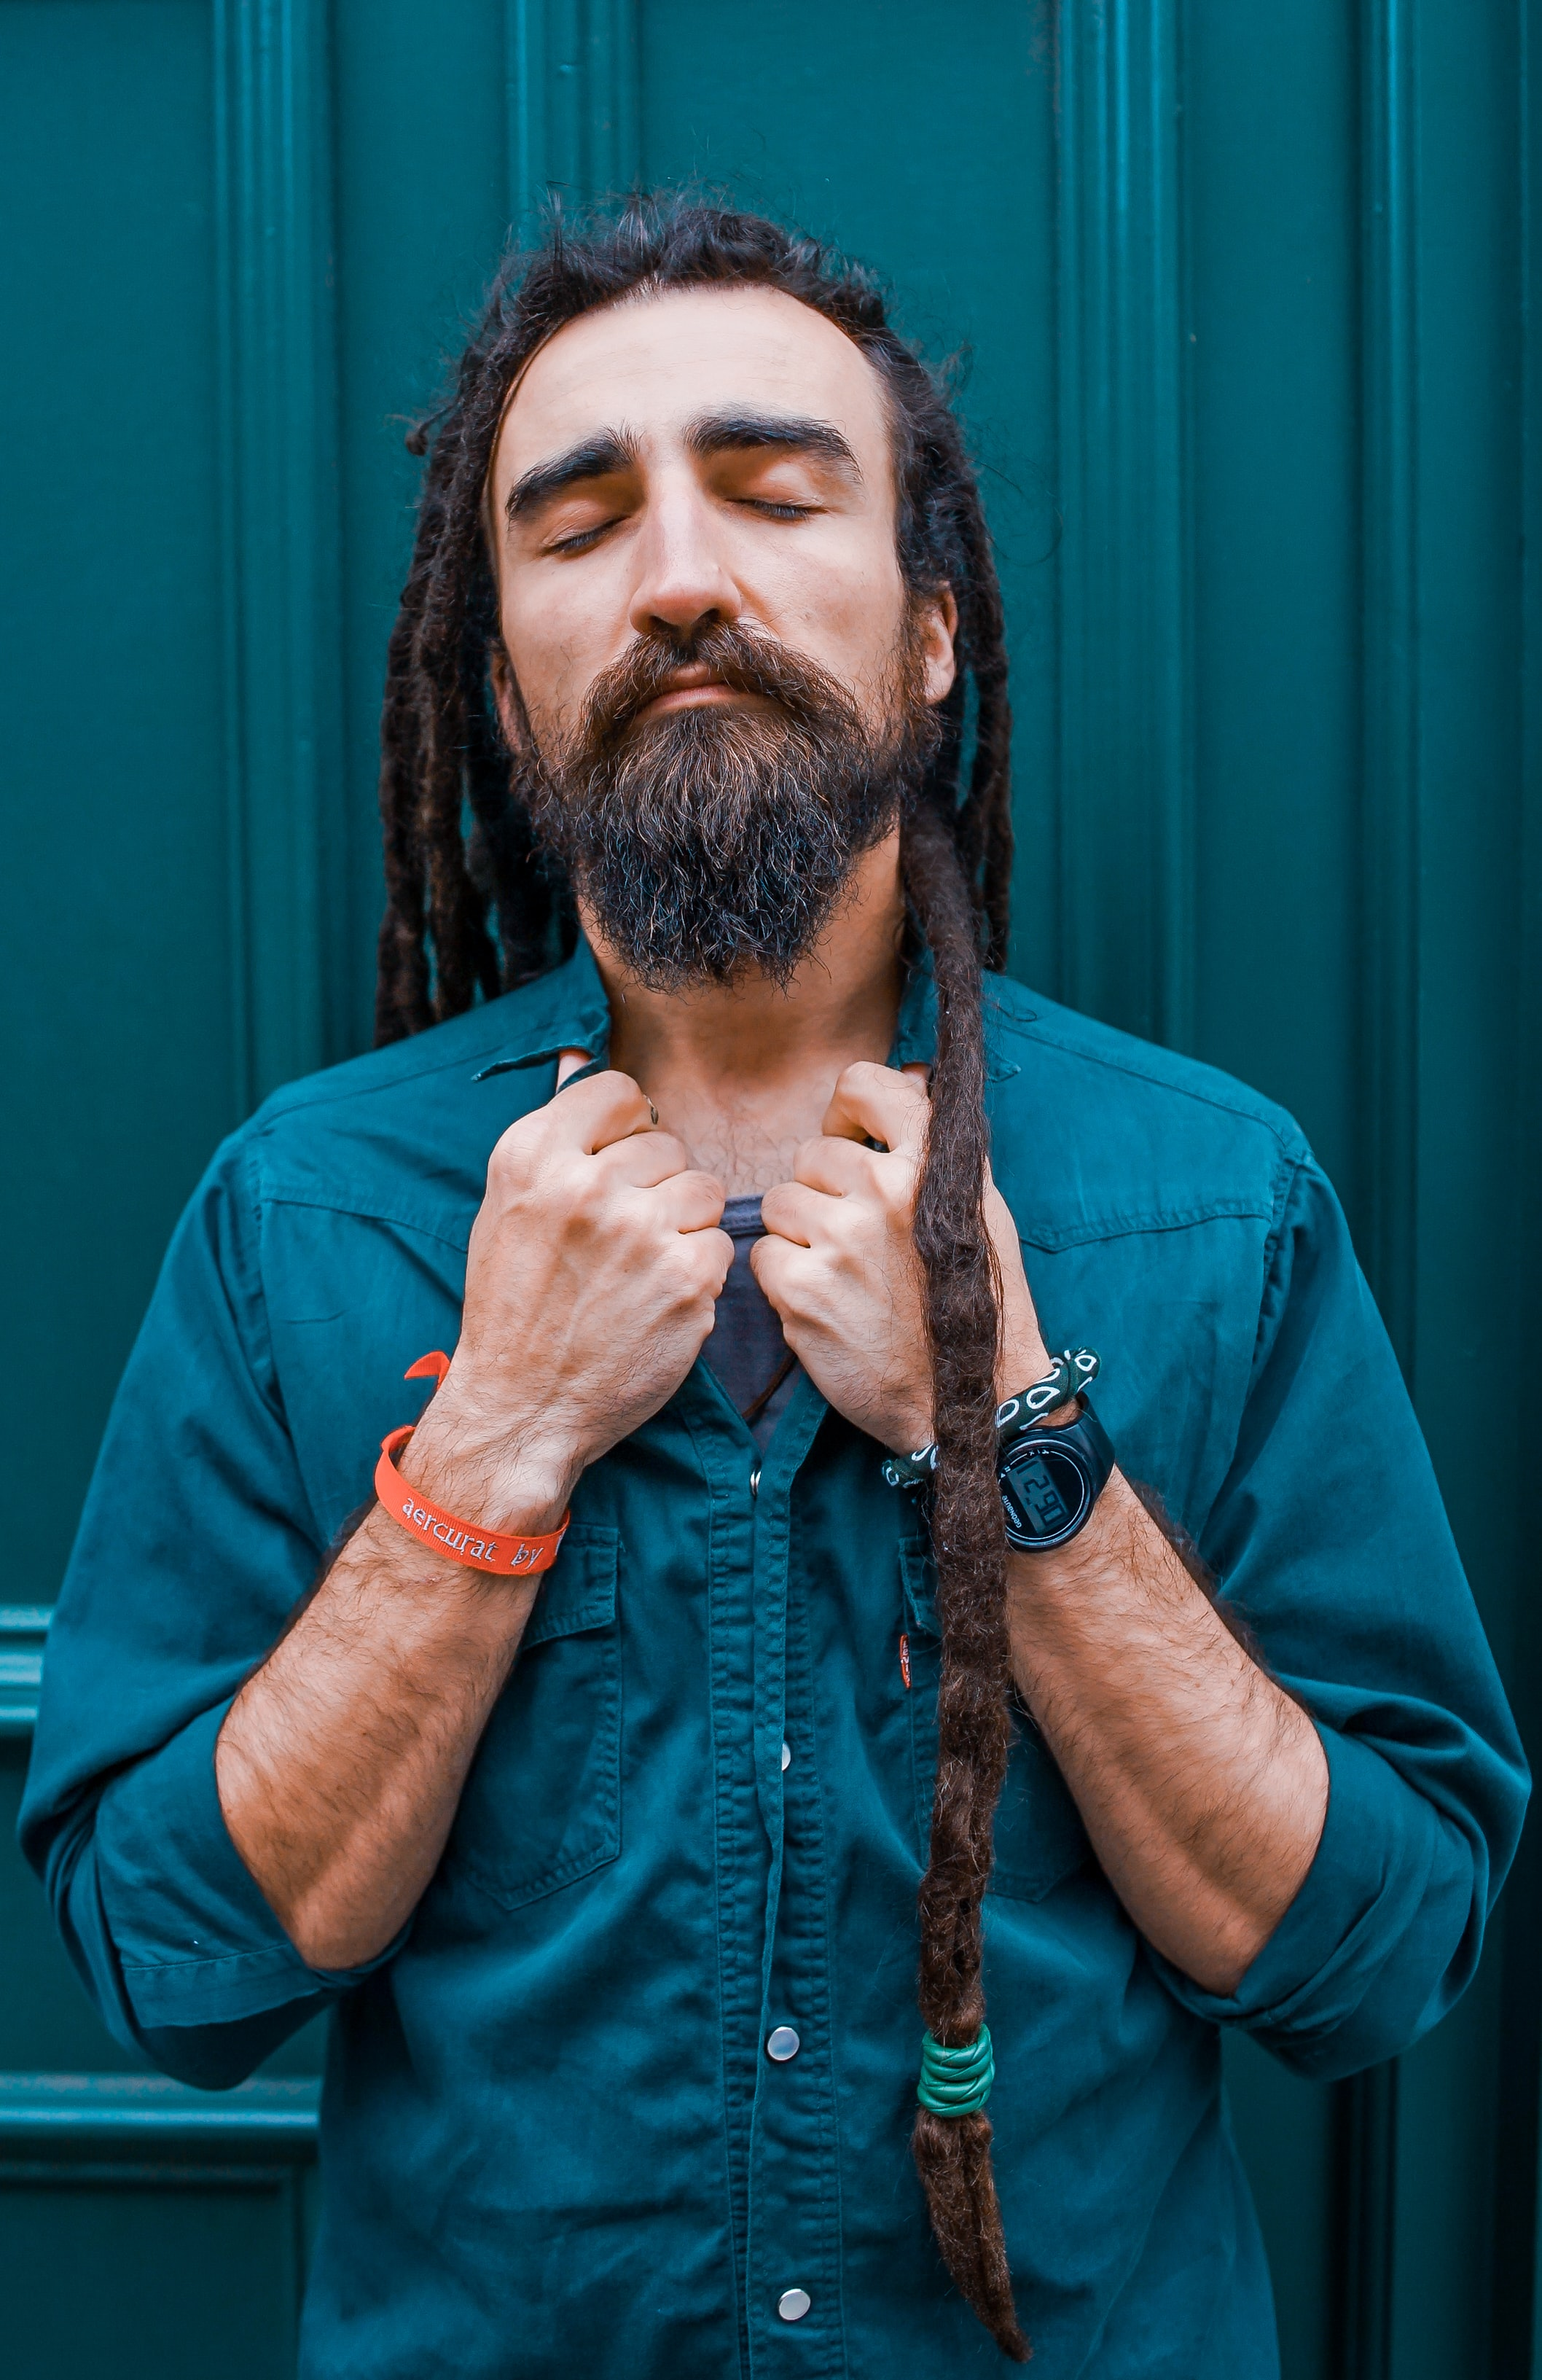 Older man with beard and dreadlocks closes his eye peacefully